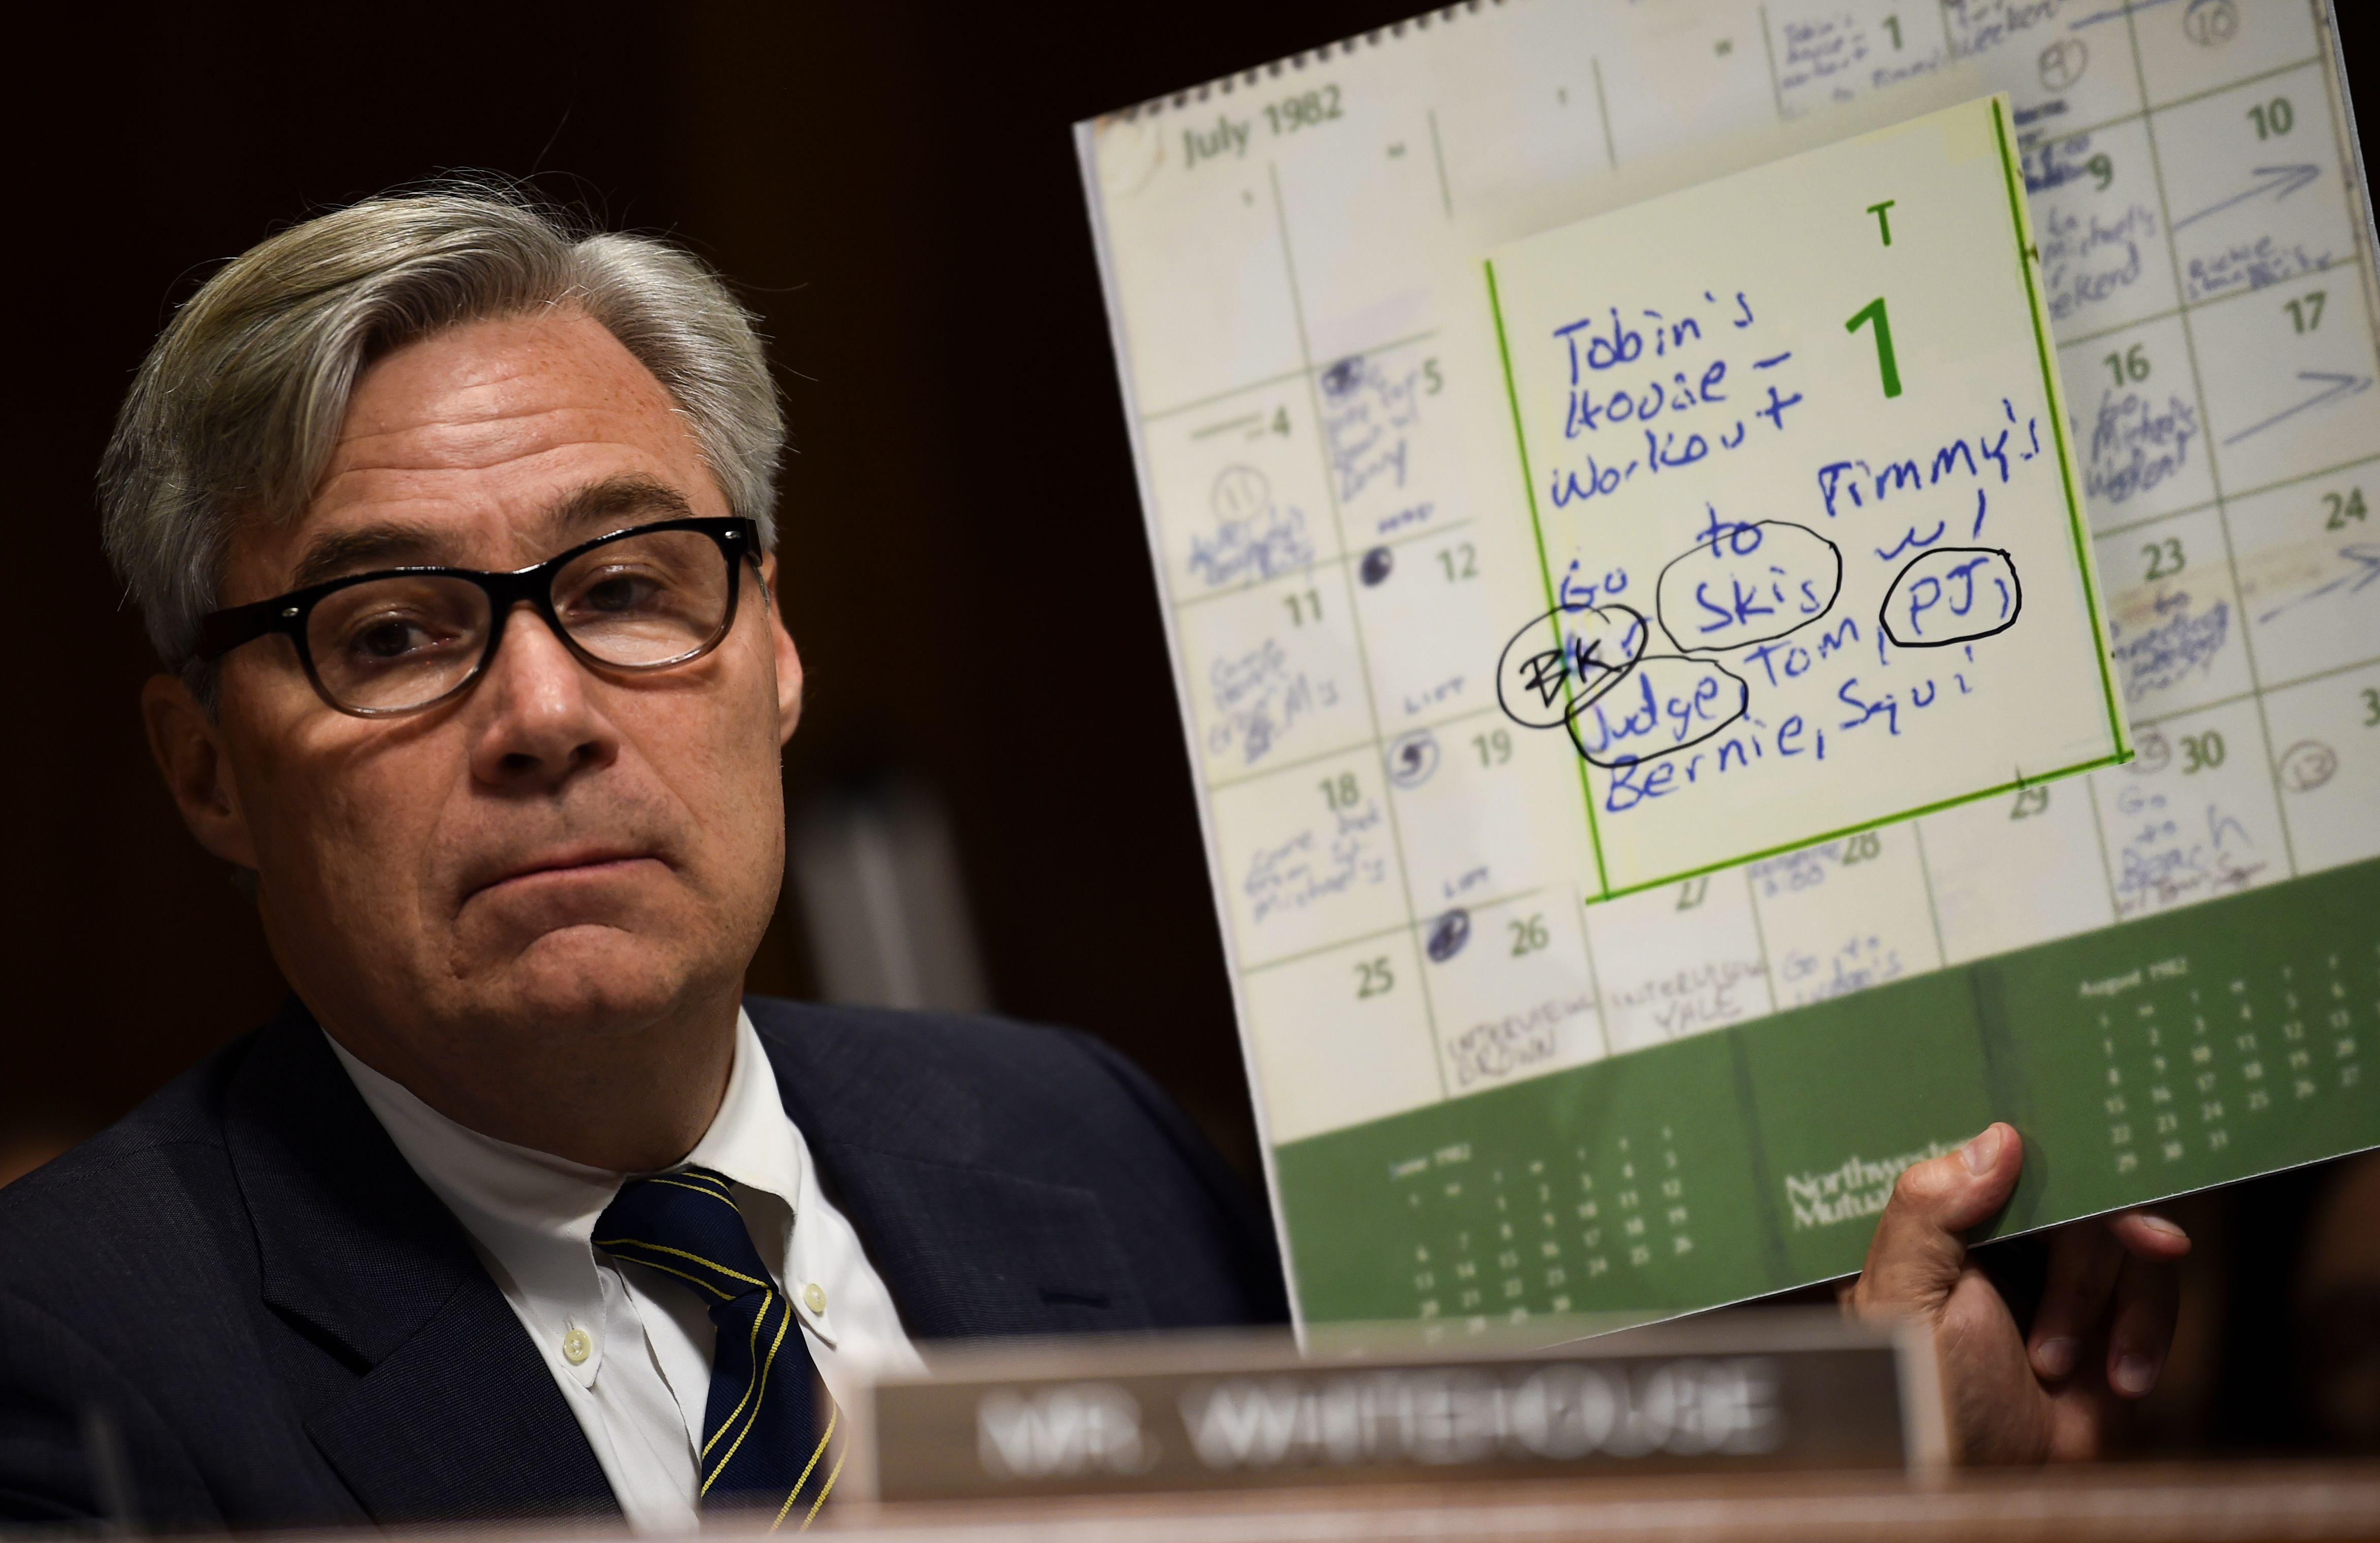 Sen. Sheldon Whitehouse (D-RI) in a hearing on Justice Brett Kavanaugh's confirmation on September 28, 2018. (Brendan Smialowski/AFP/Getty Images)